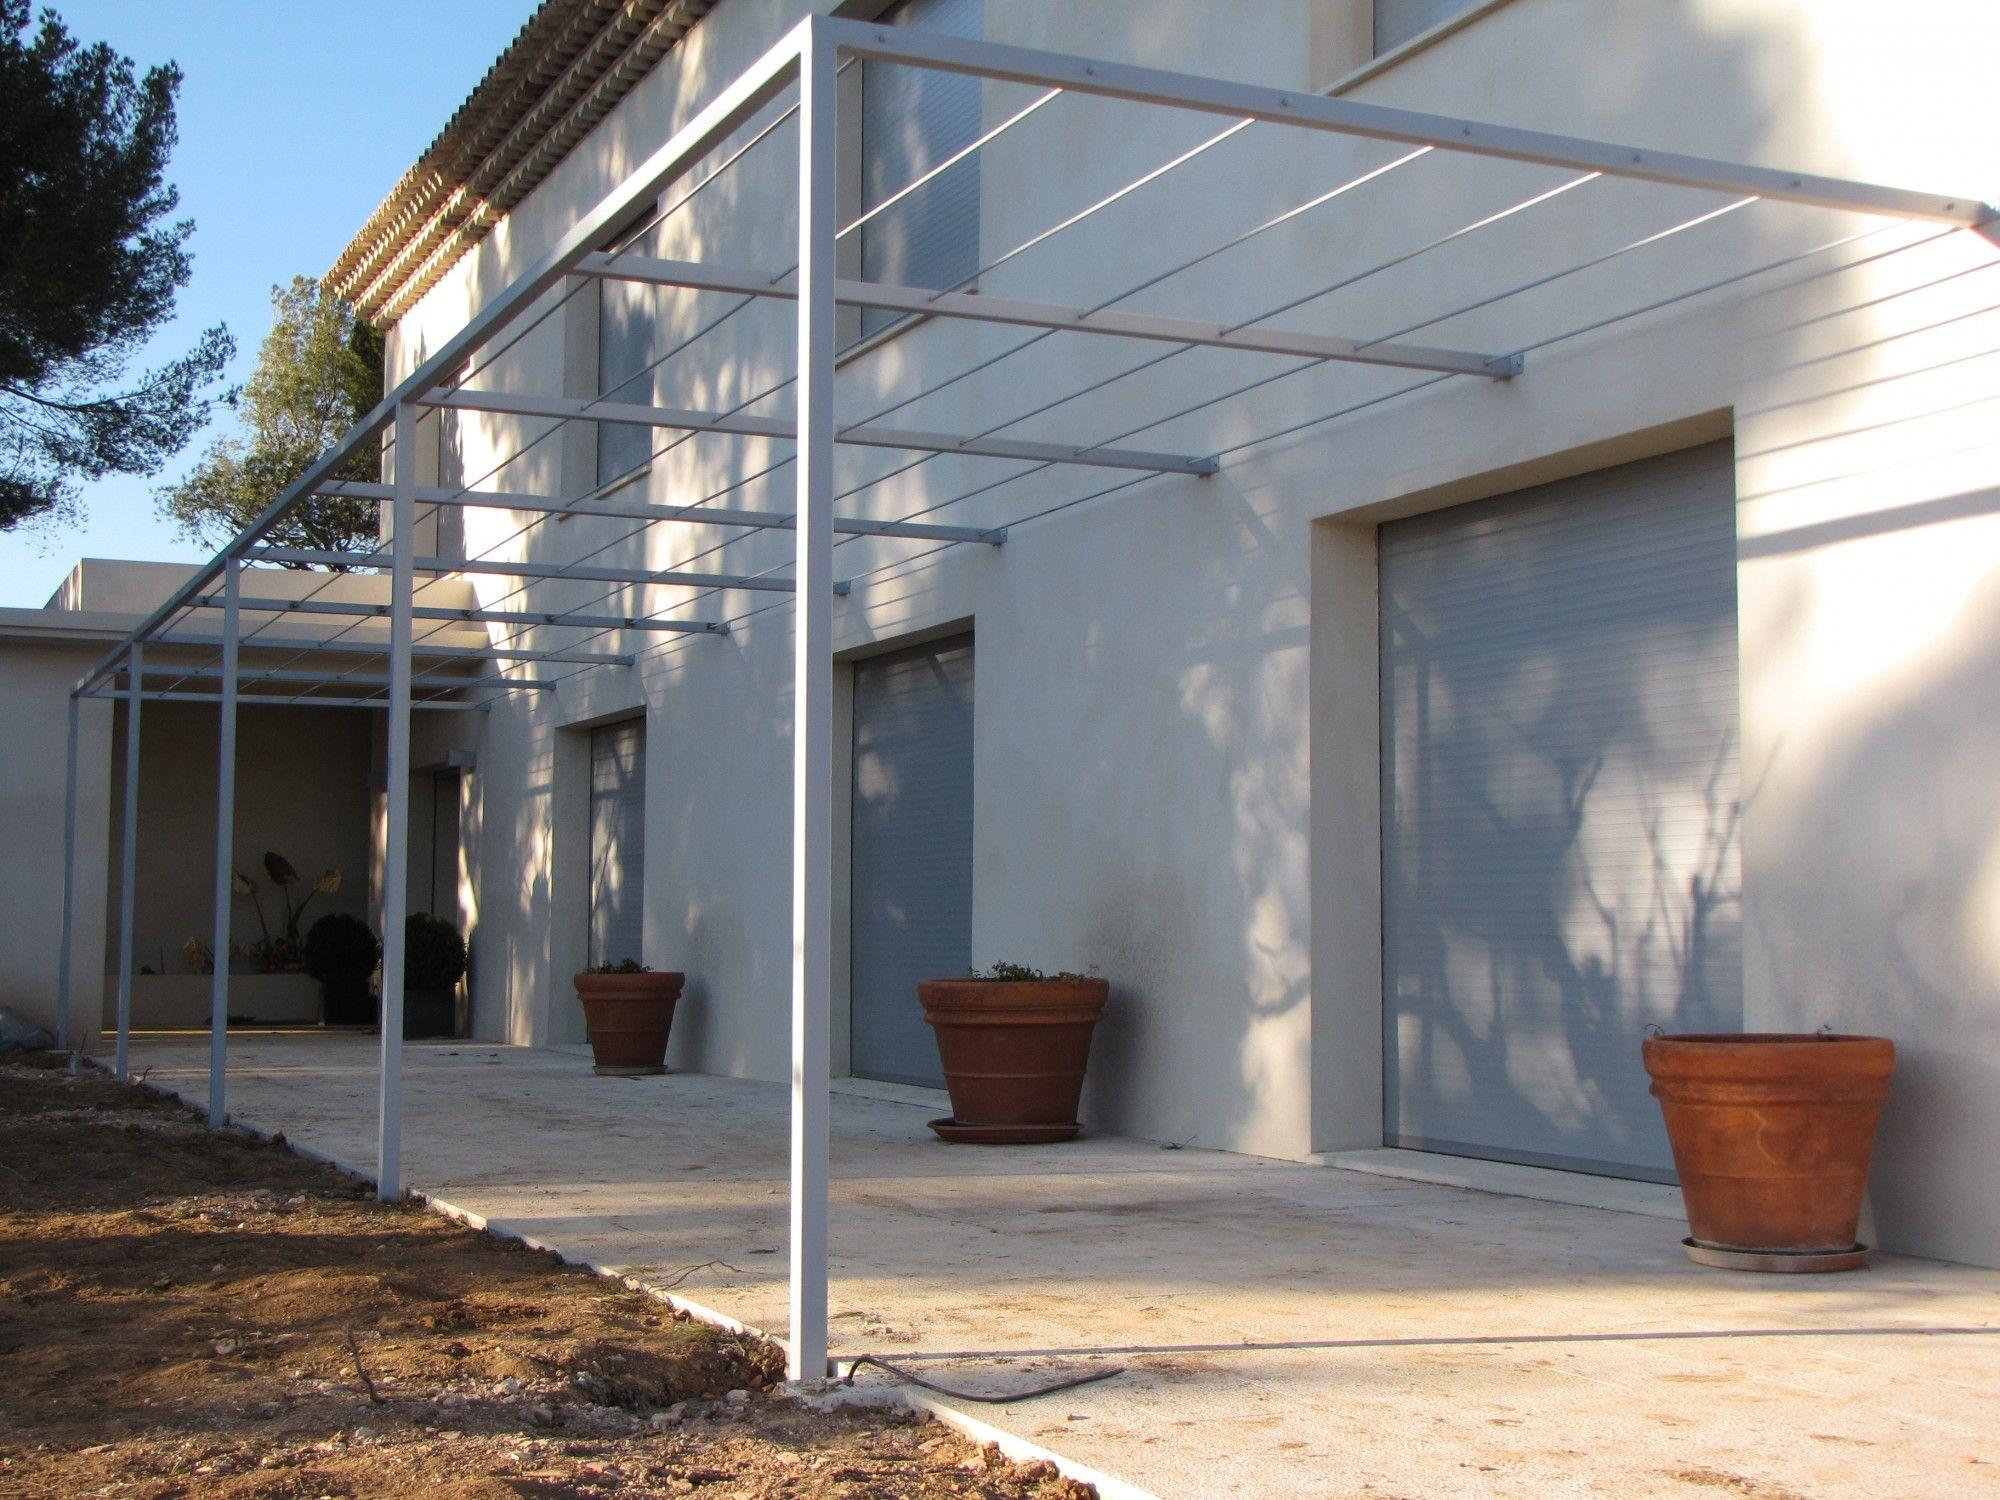 pergola metallique moderne diy pinterest pergola pergola metallique et pergola terrasse. Black Bedroom Furniture Sets. Home Design Ideas